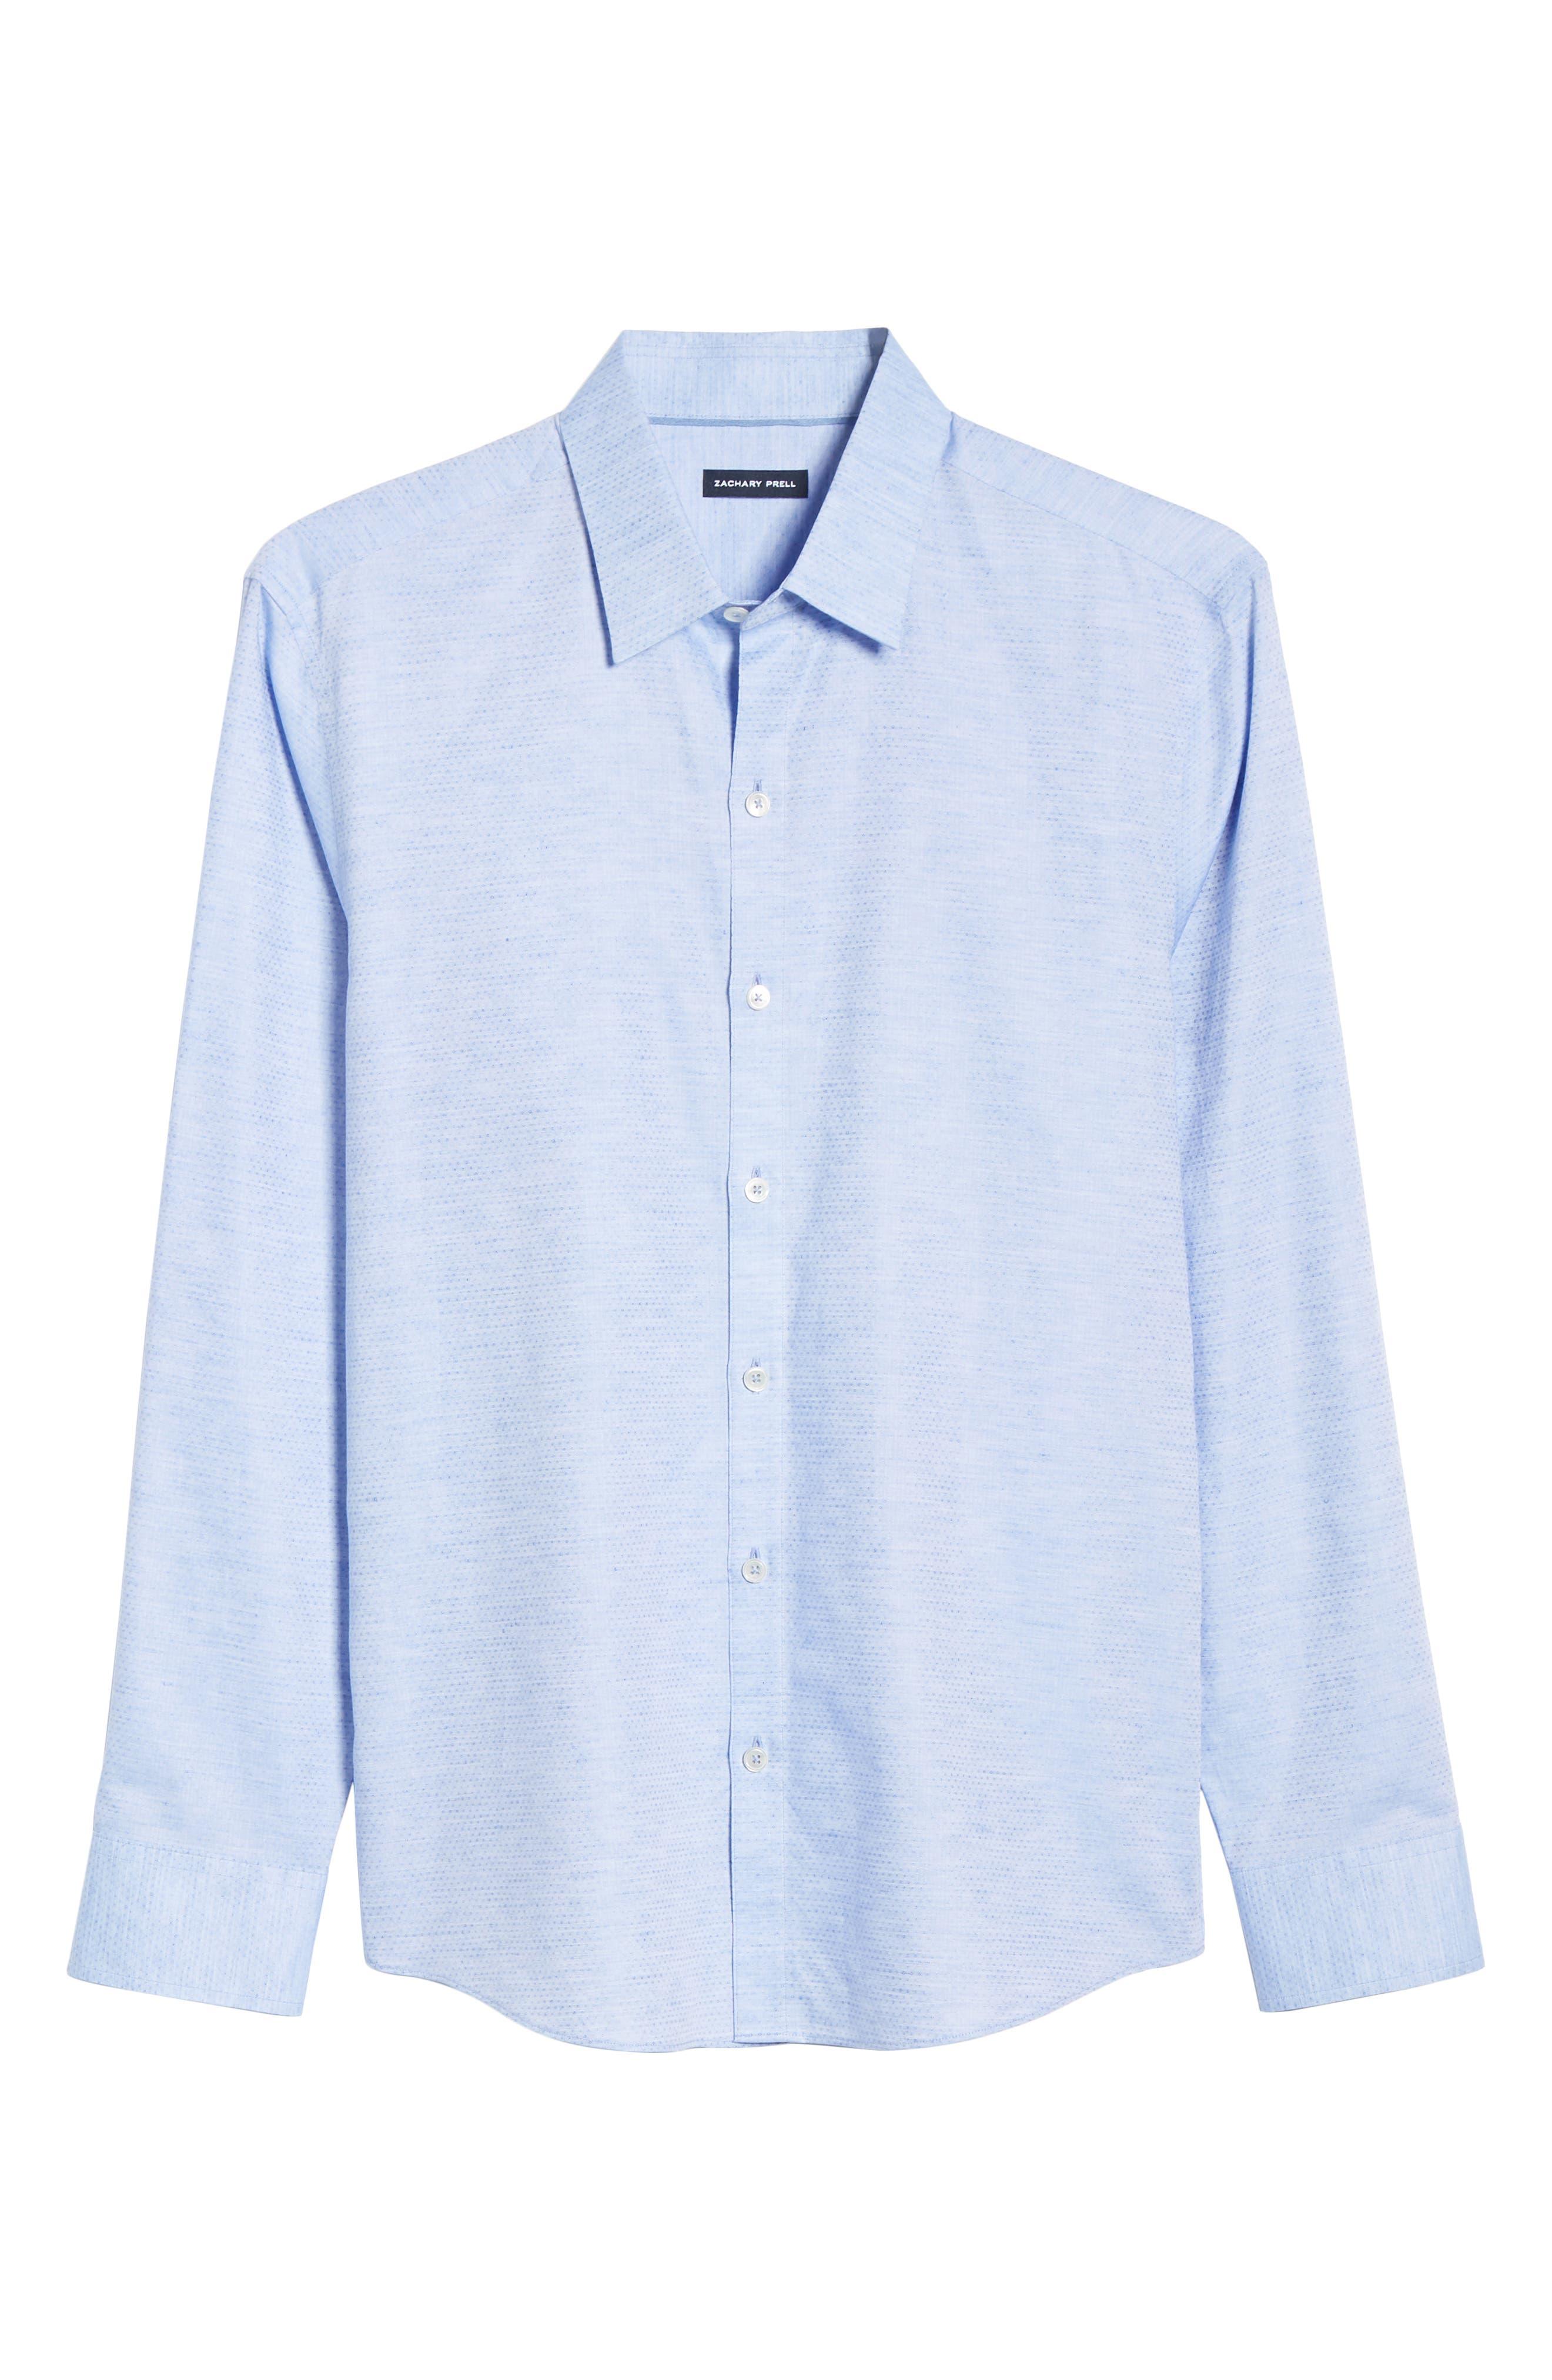 ZACHARY PRELL, Alfano Regular Fit Cotton & Linen Sport Shirt, Alternate thumbnail 5, color, LT BLUE